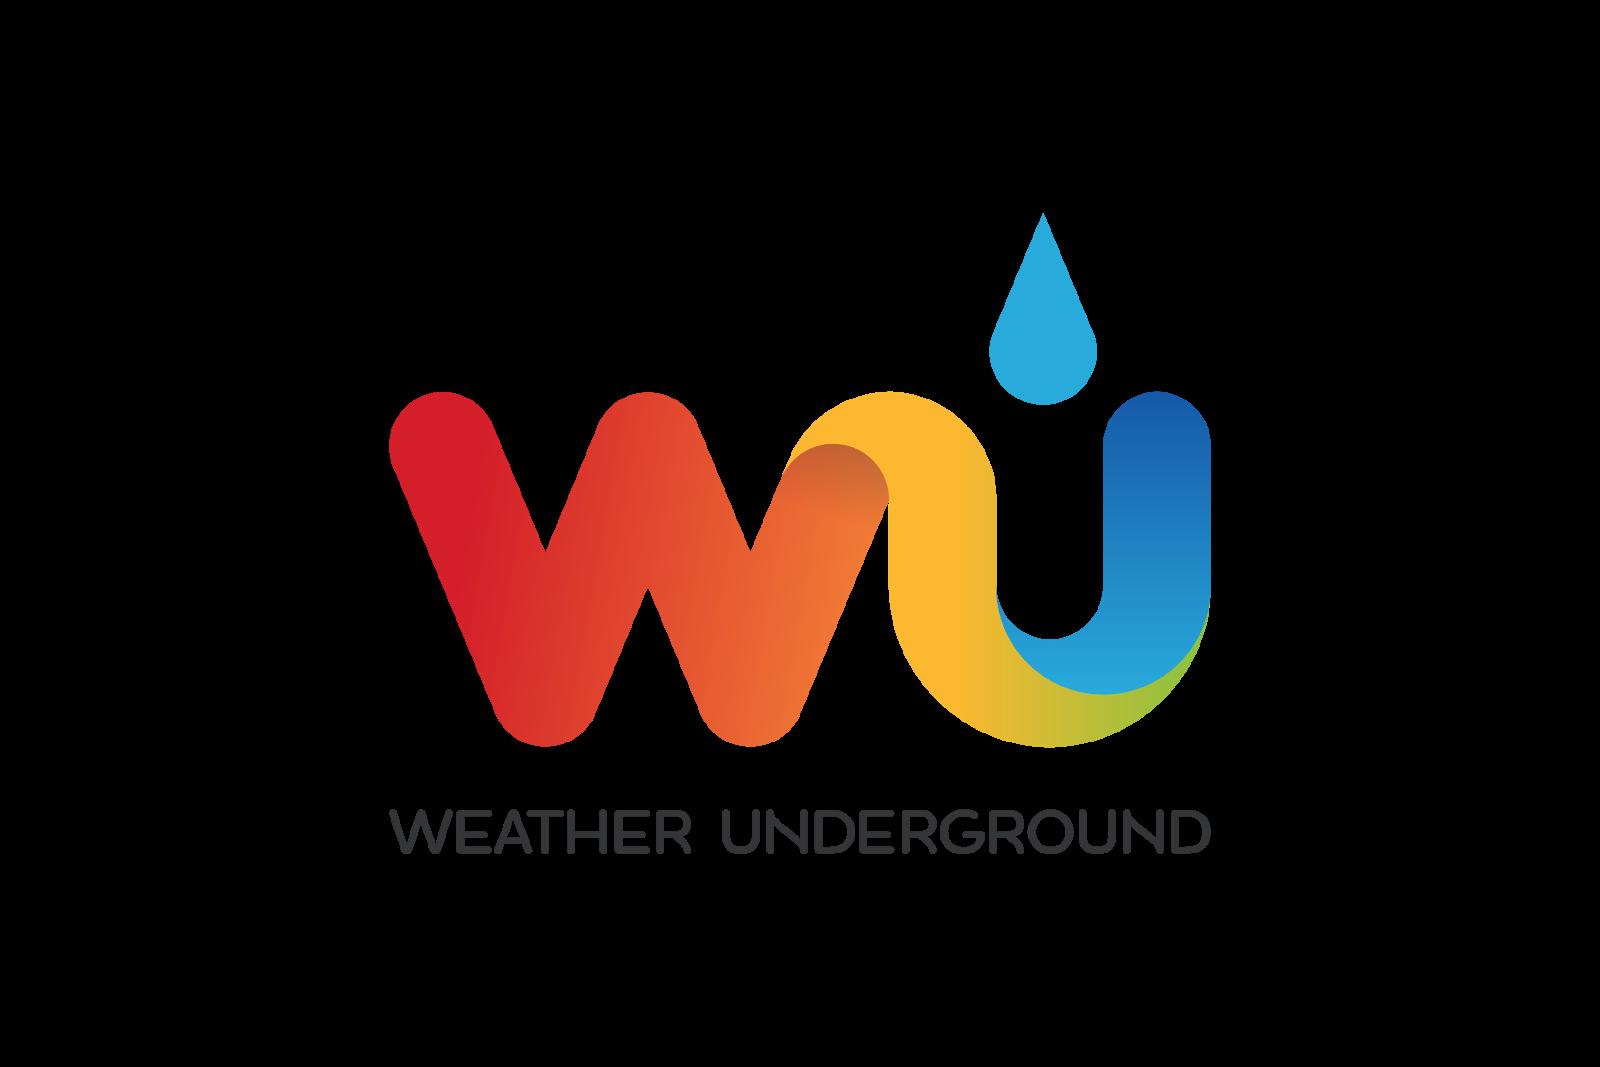 https://www.wunderground.com